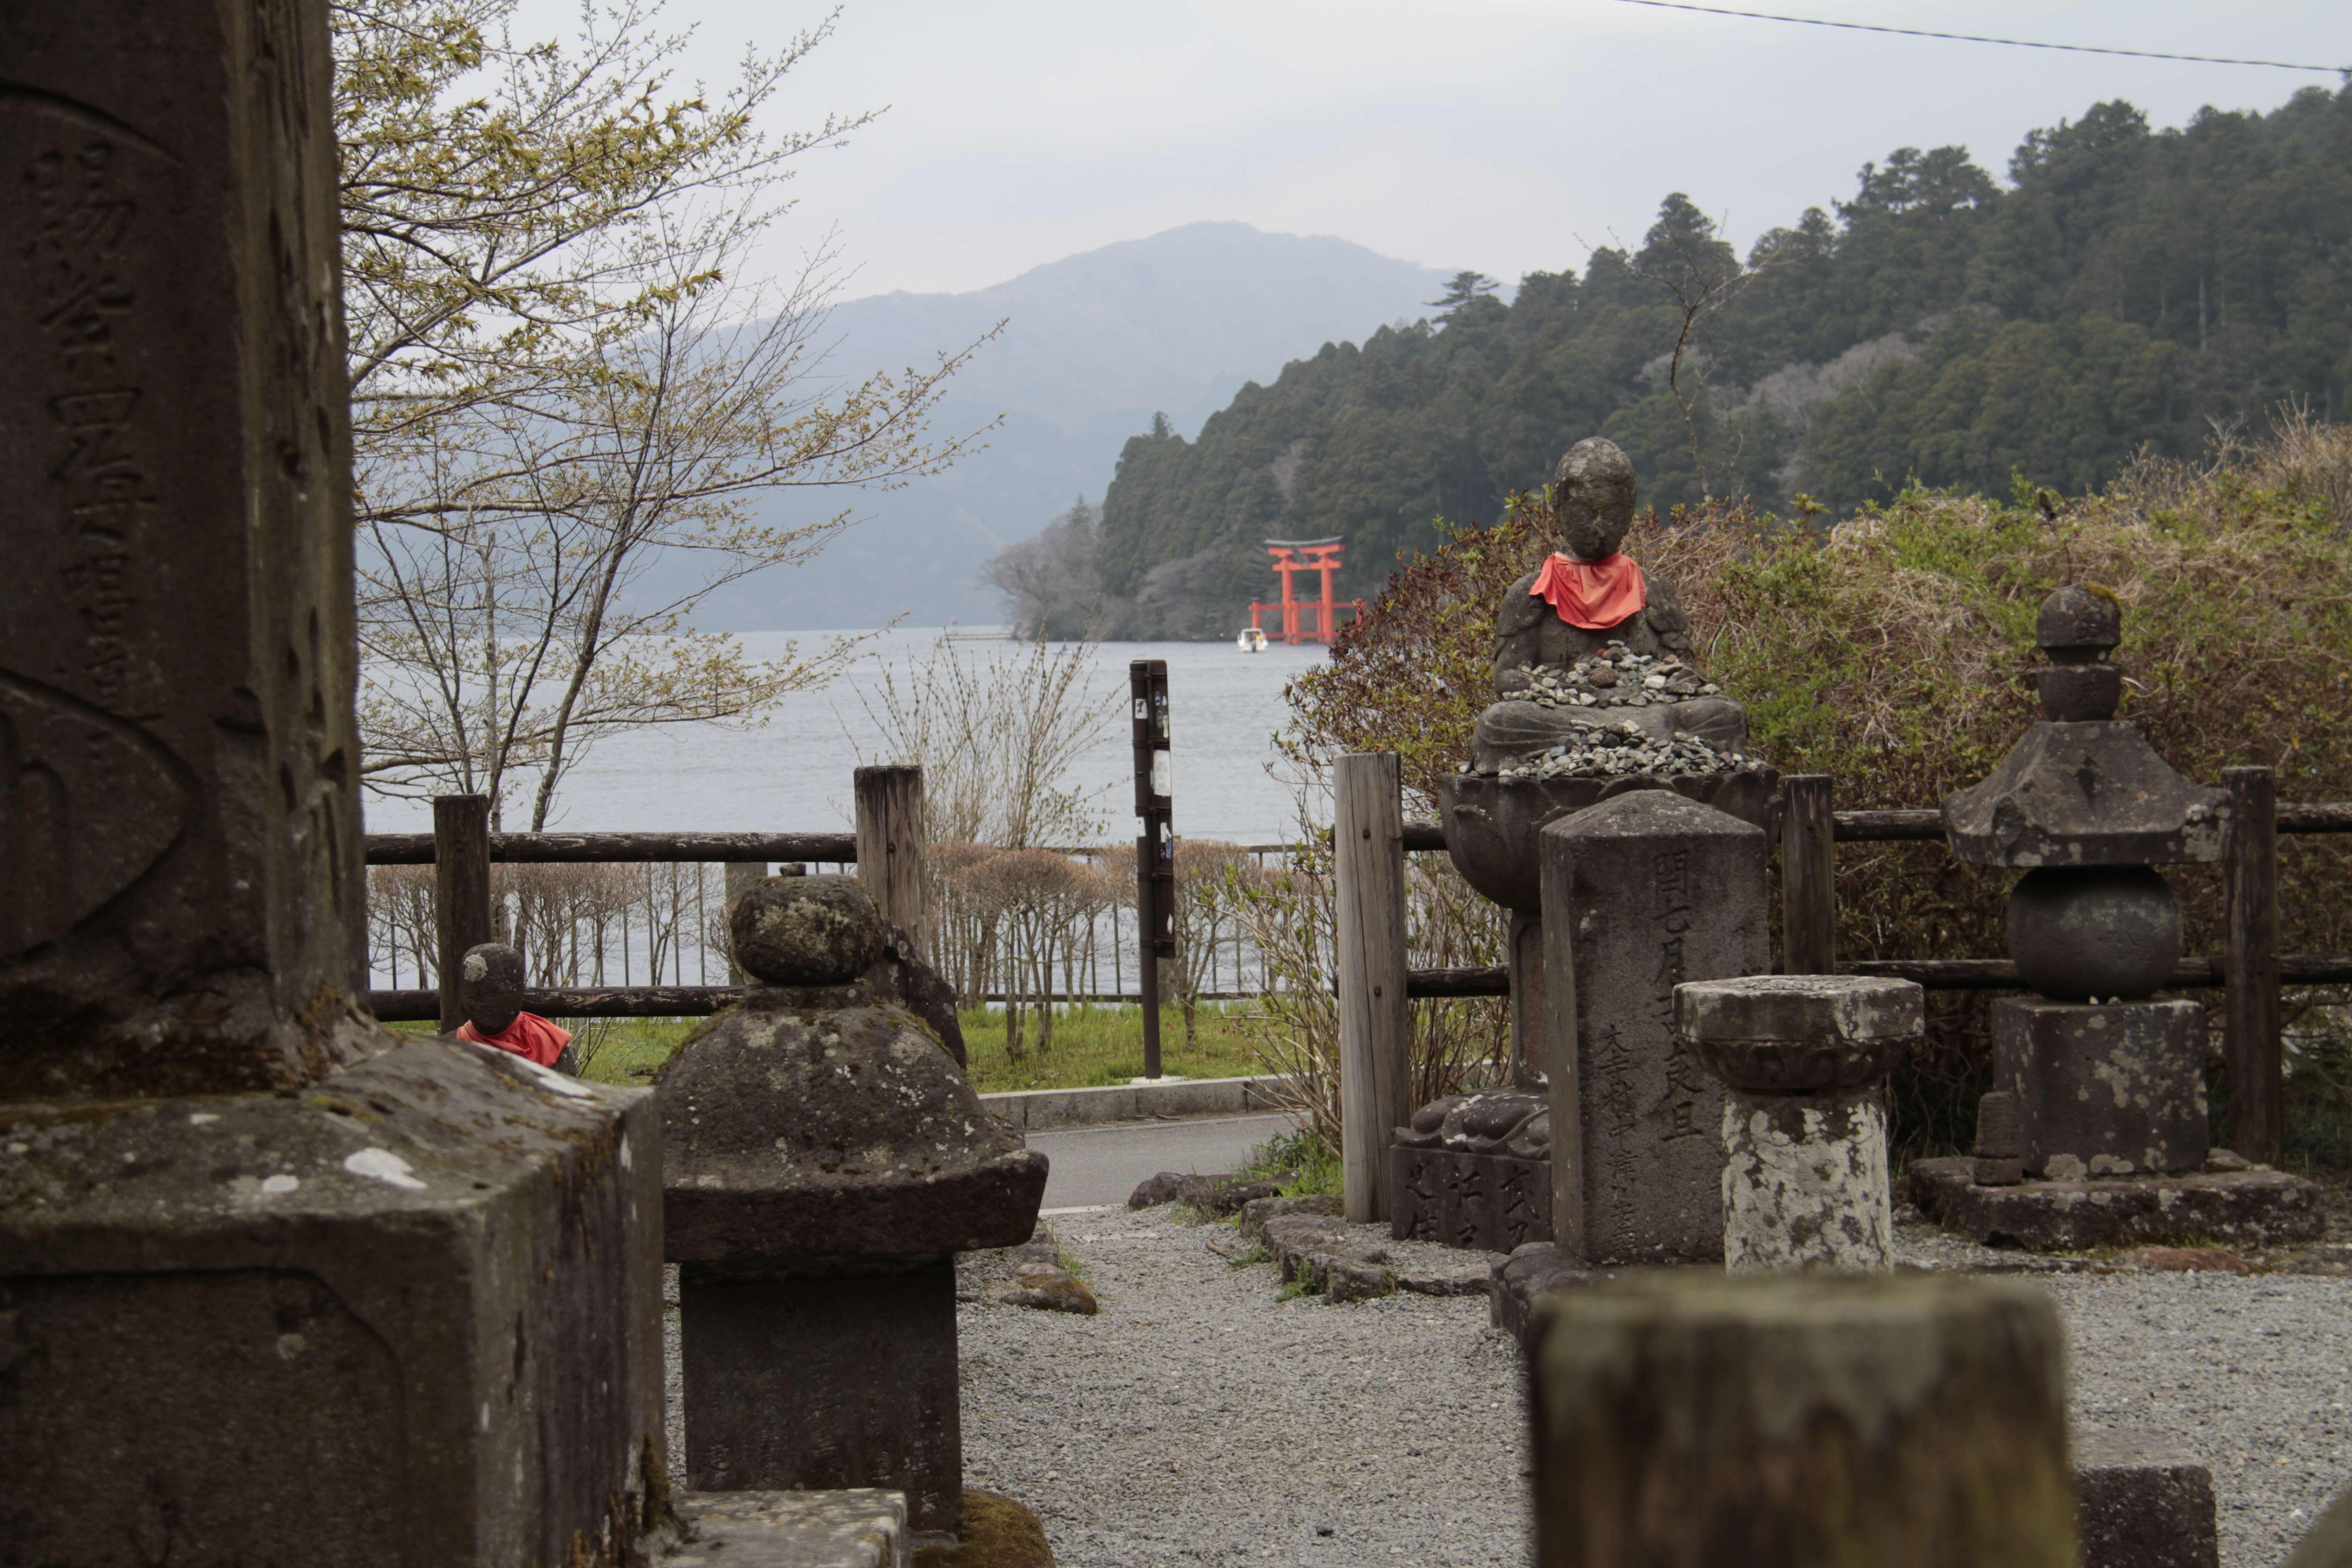 Japon avril 2017_0388 Hakone temple bouddhiste Nichirinji